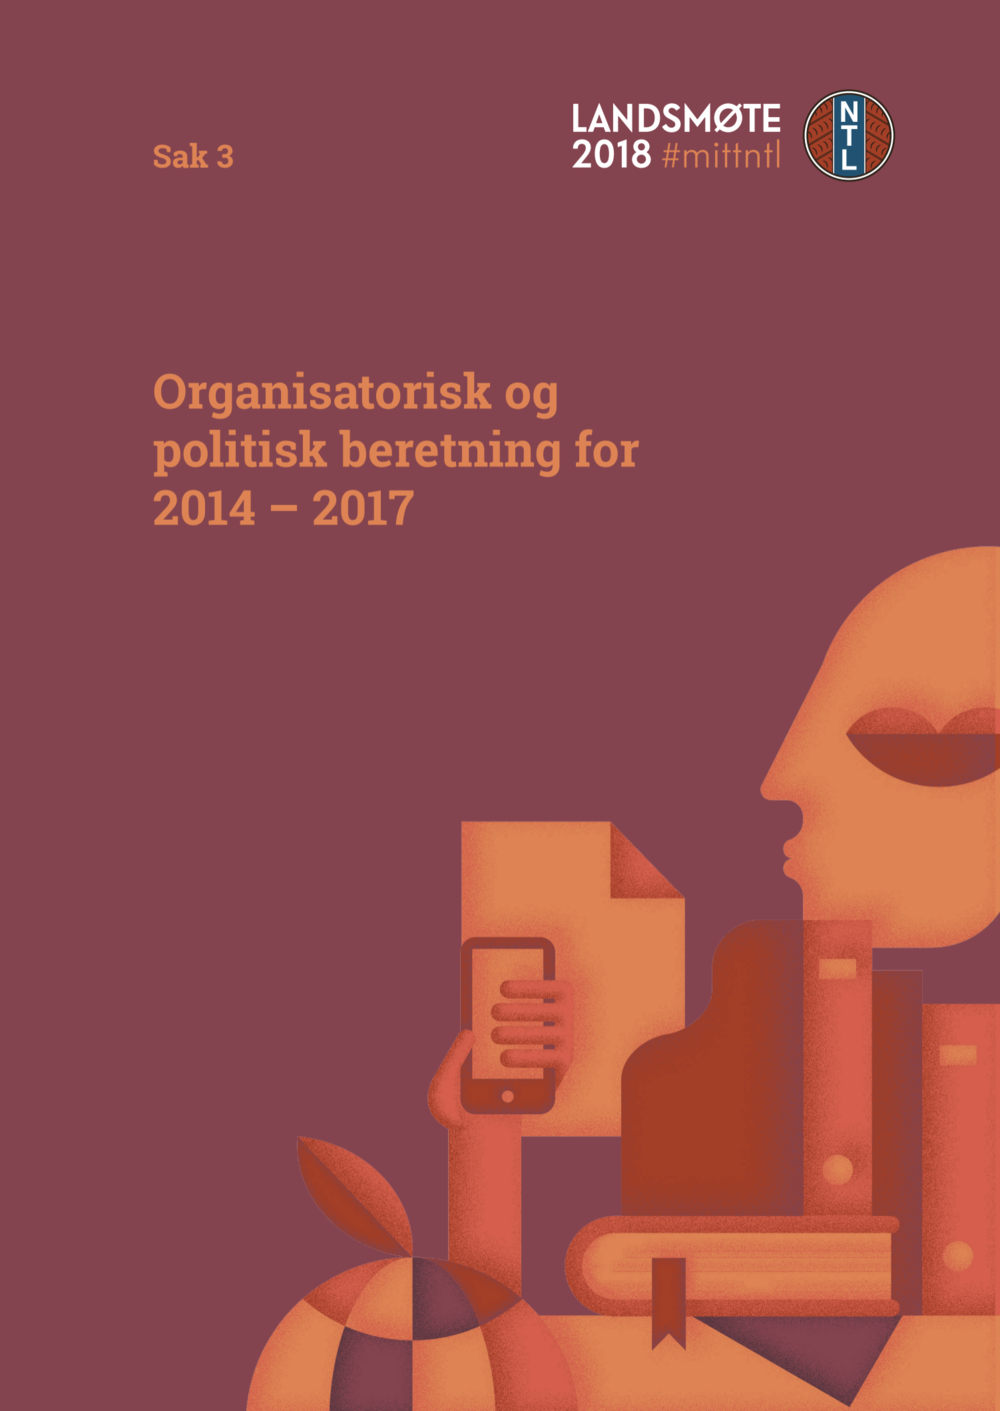 Organisatoriske og politisk beretning for 2014-2017 - Last ned:Innstilling til sak 3Organisatoriske beretninger2014 - 2017Politisk beretning 2014-2017